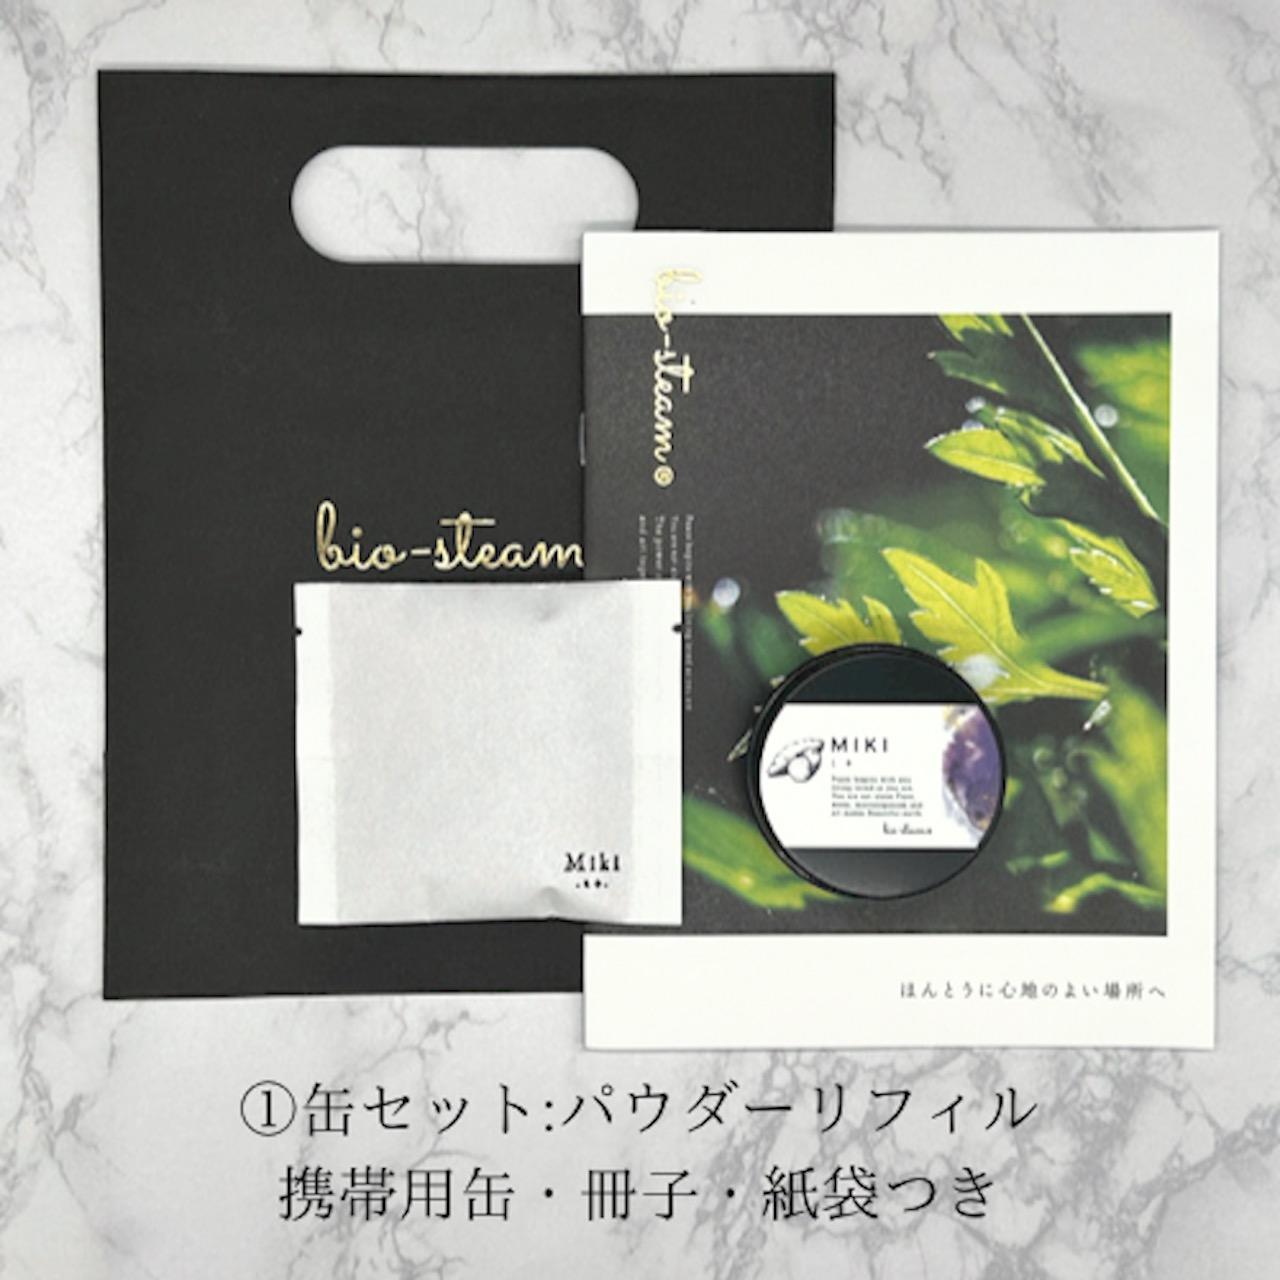 ★【Black Label】 国産ミキパウダー